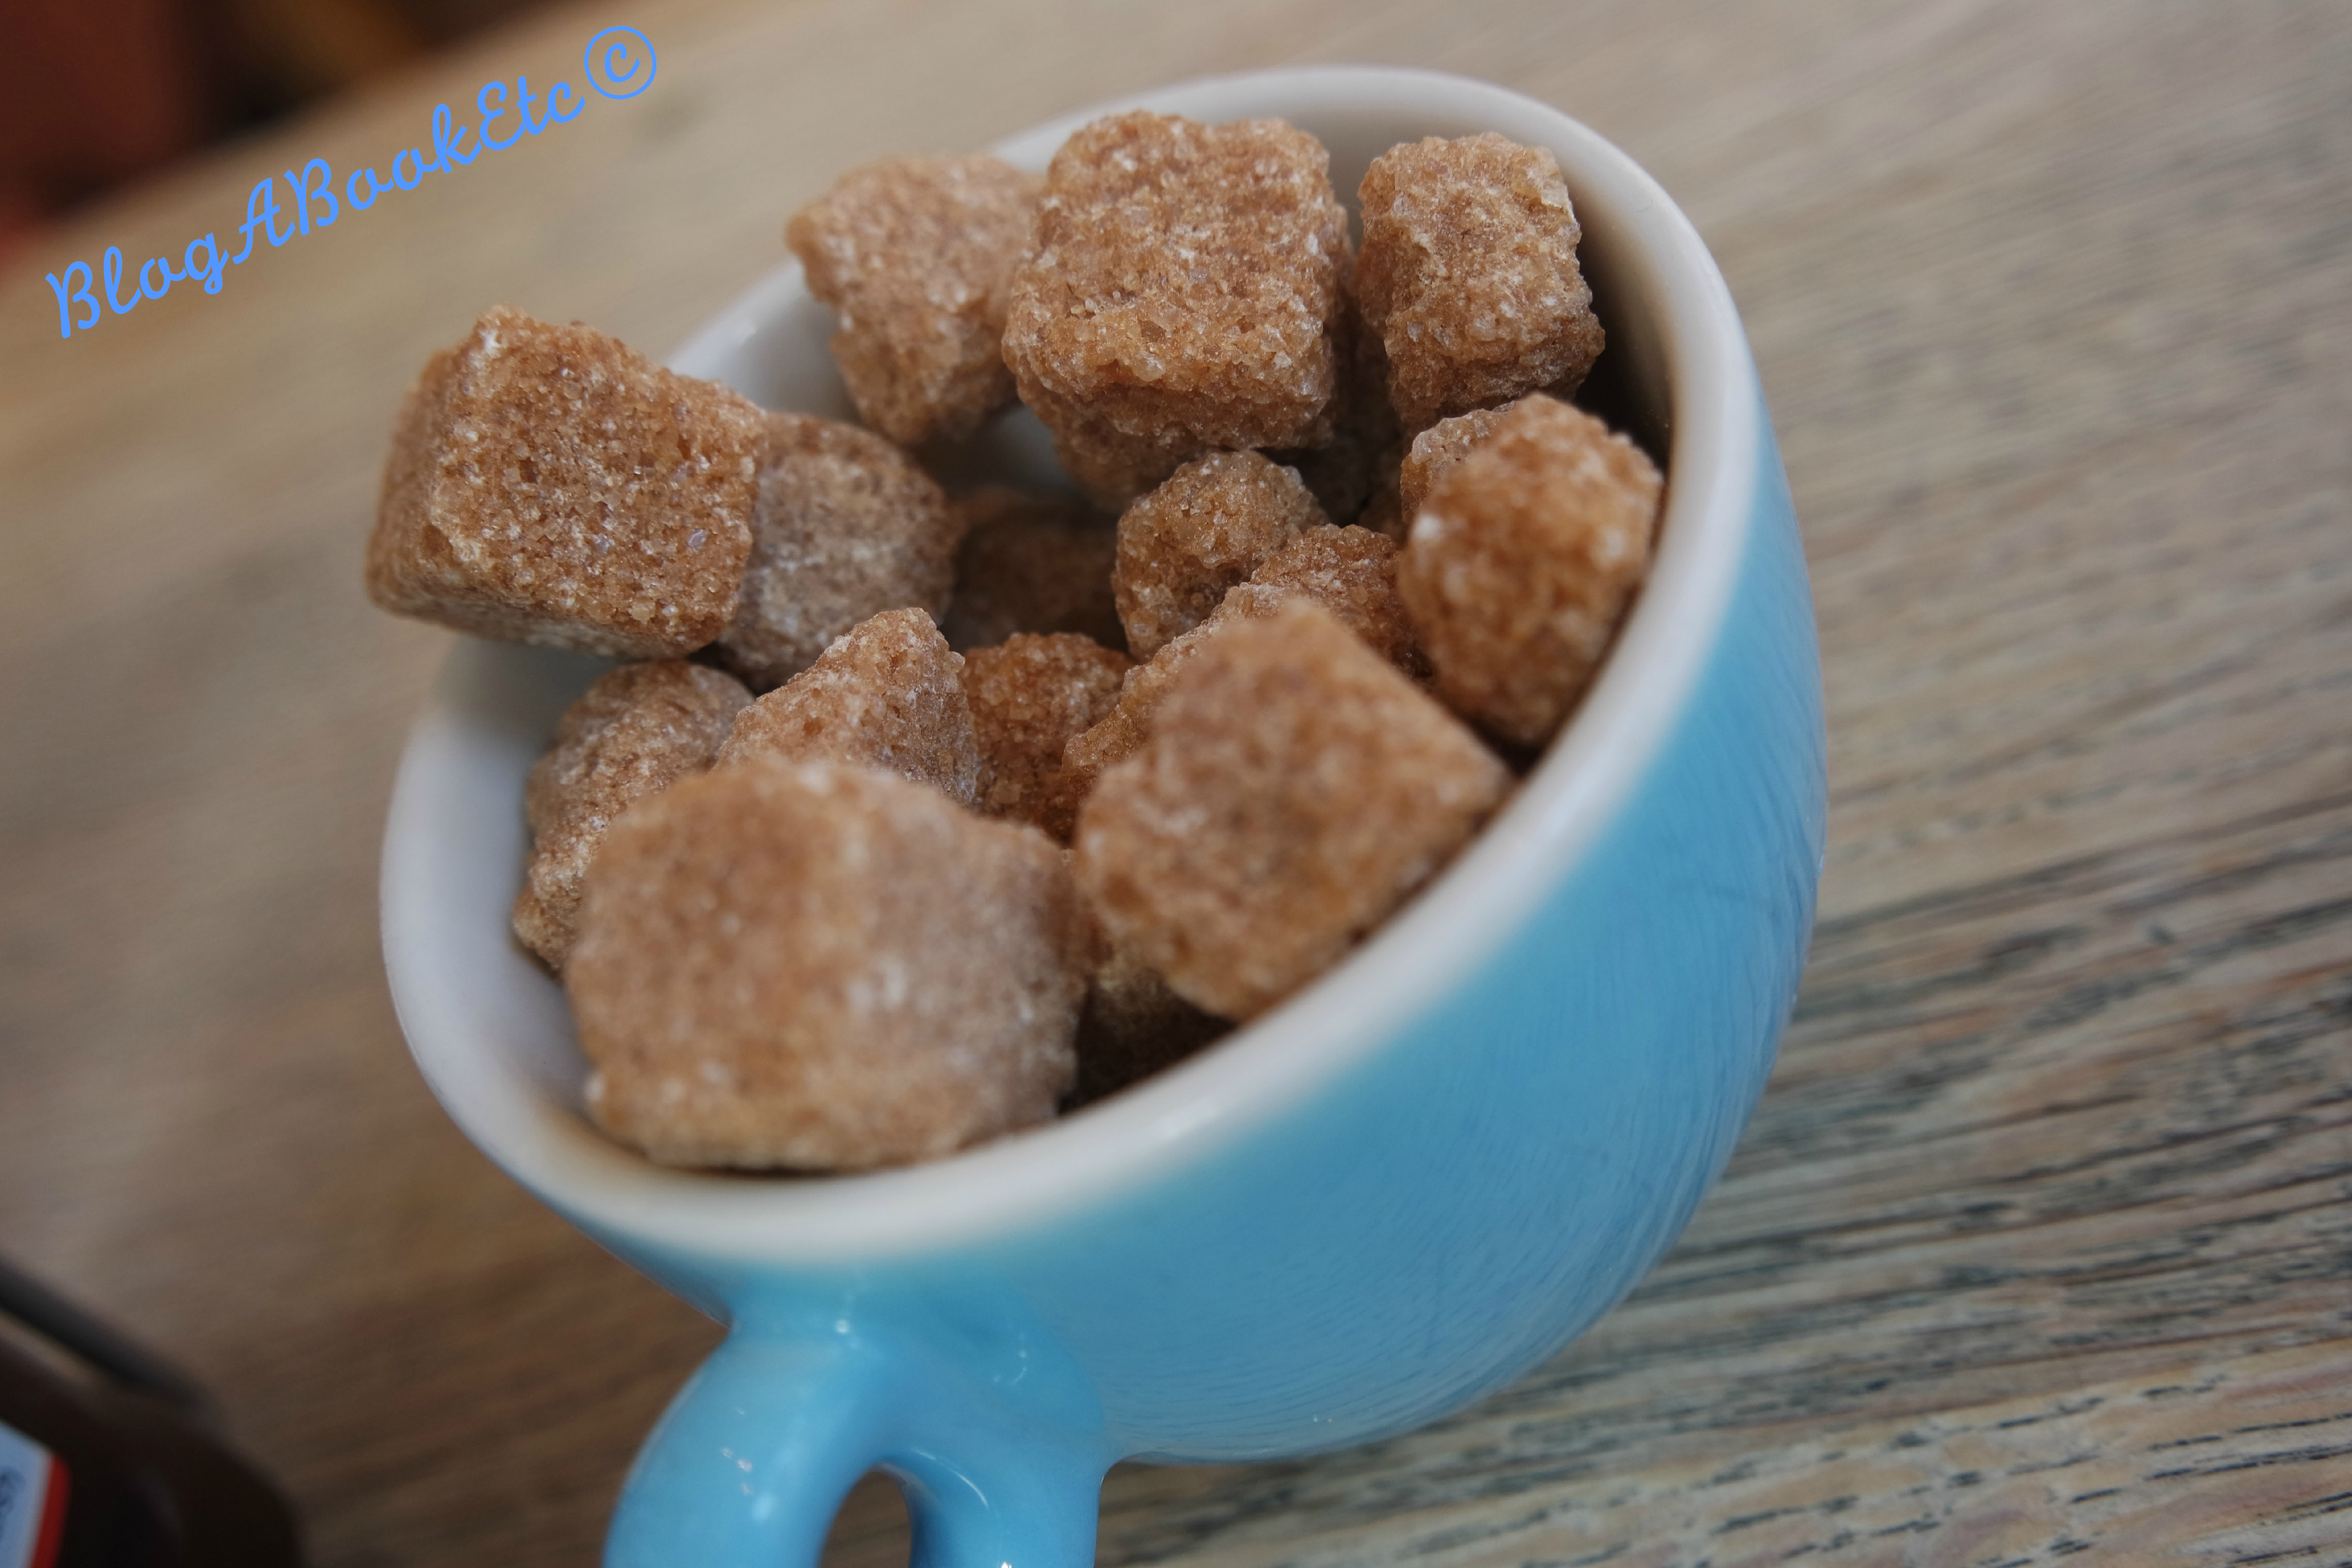 Sugar, Coffee, M1LK, Balham, London, Blog A Book Etc, Fay